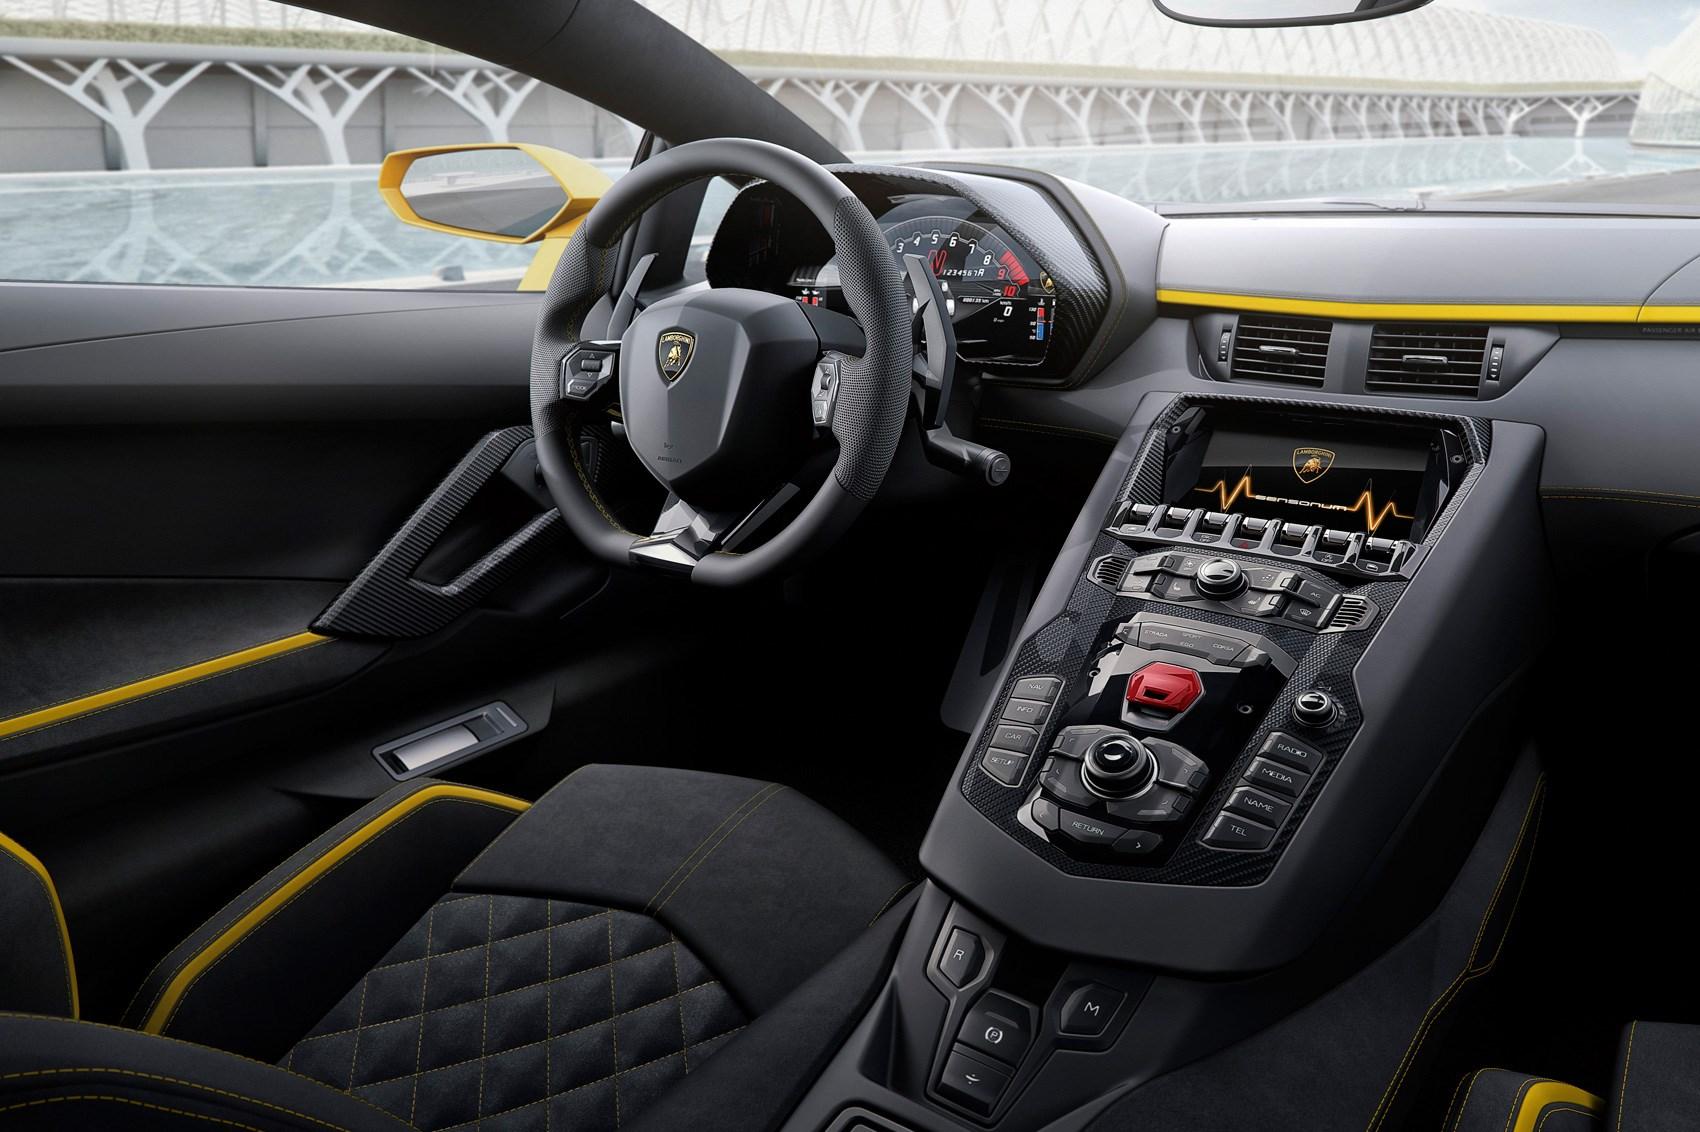 New 2017 Lamborghini Aventador S Unveiled By Car Magazine